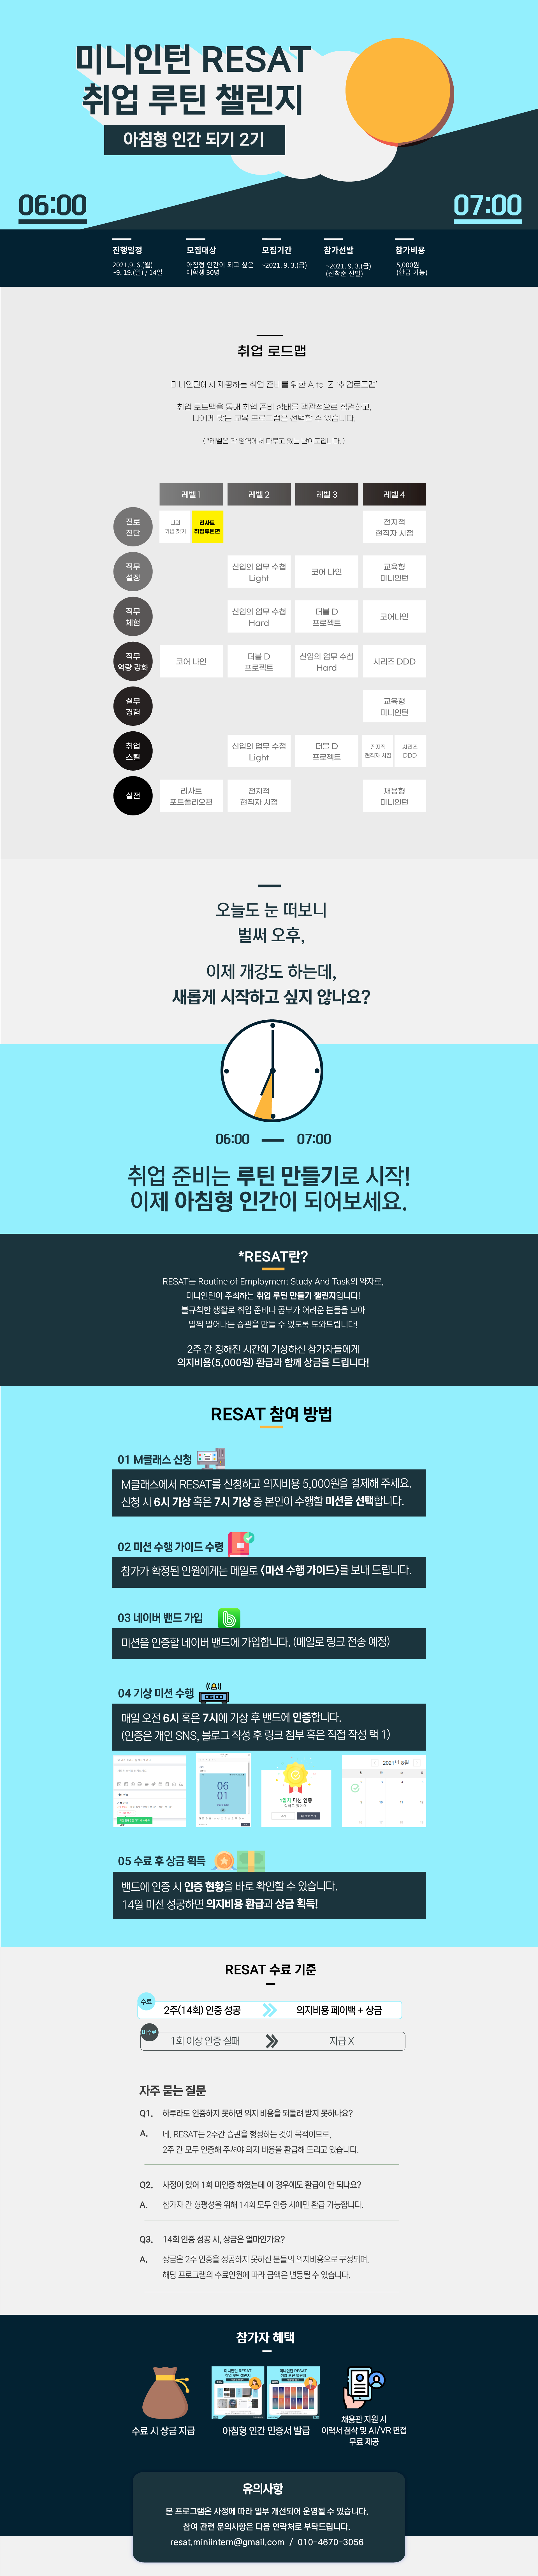 RESAT <아침형 인간 되기> 2기